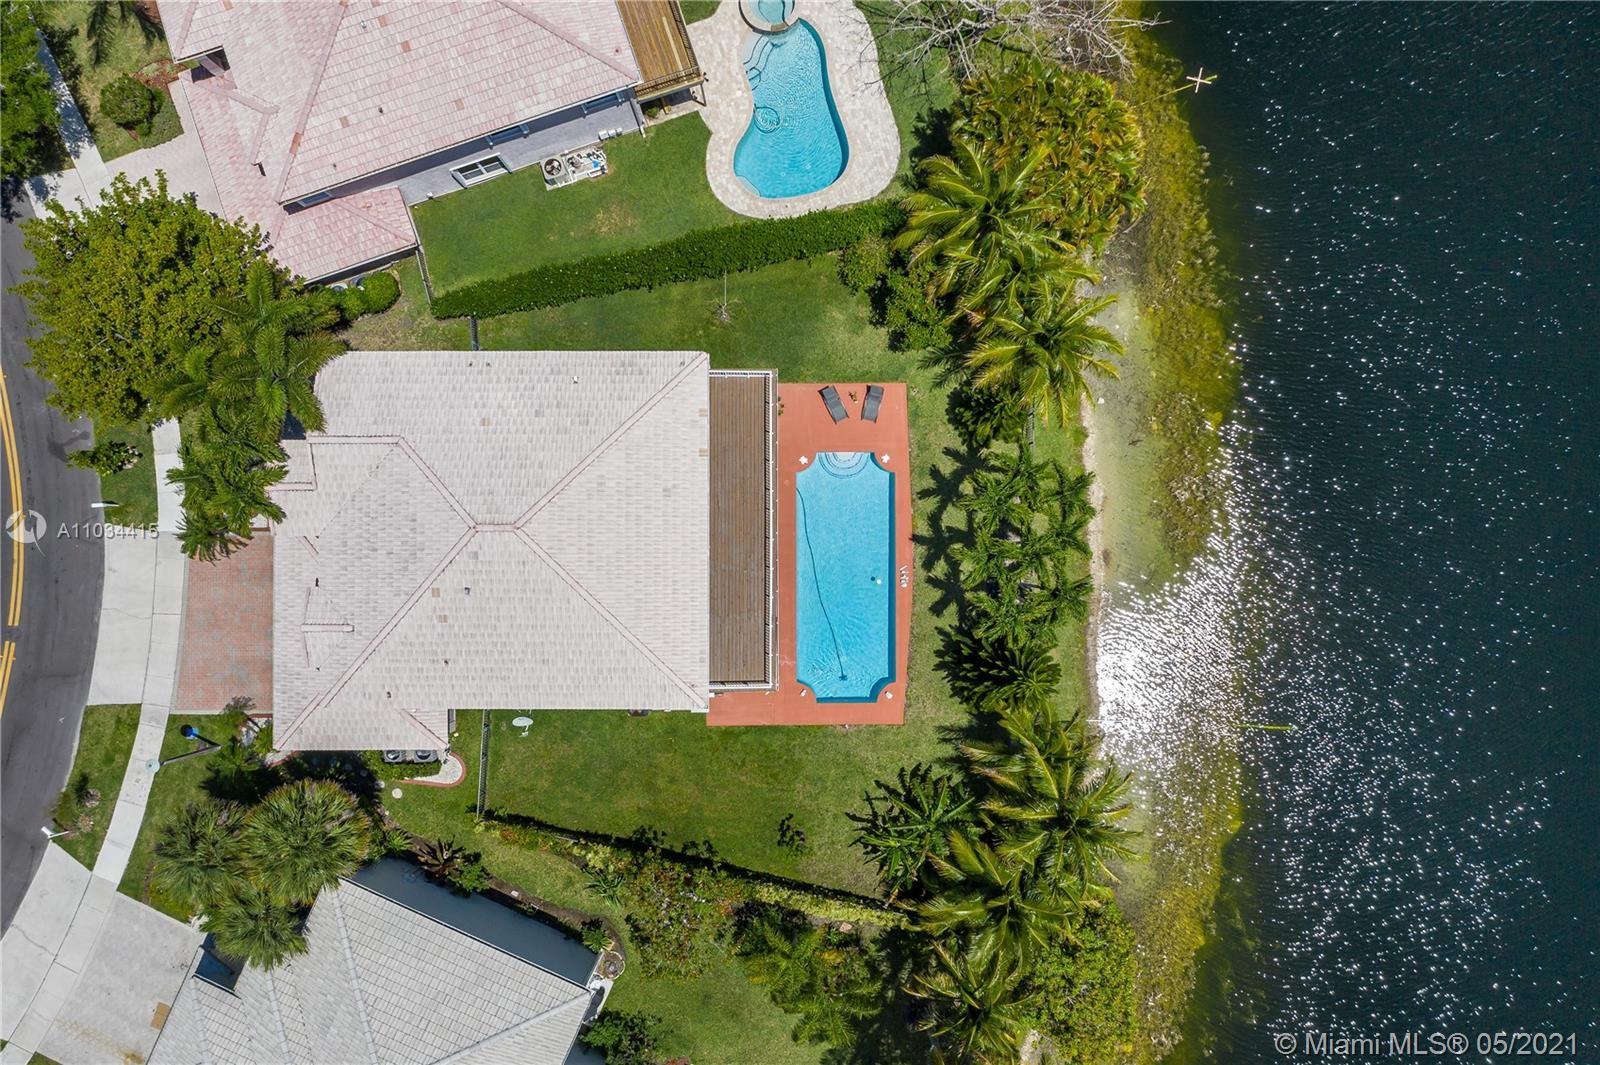 Photo of 3299 SW 173rd Ter, Miramar, FL 33029 (MLS # A11034415)